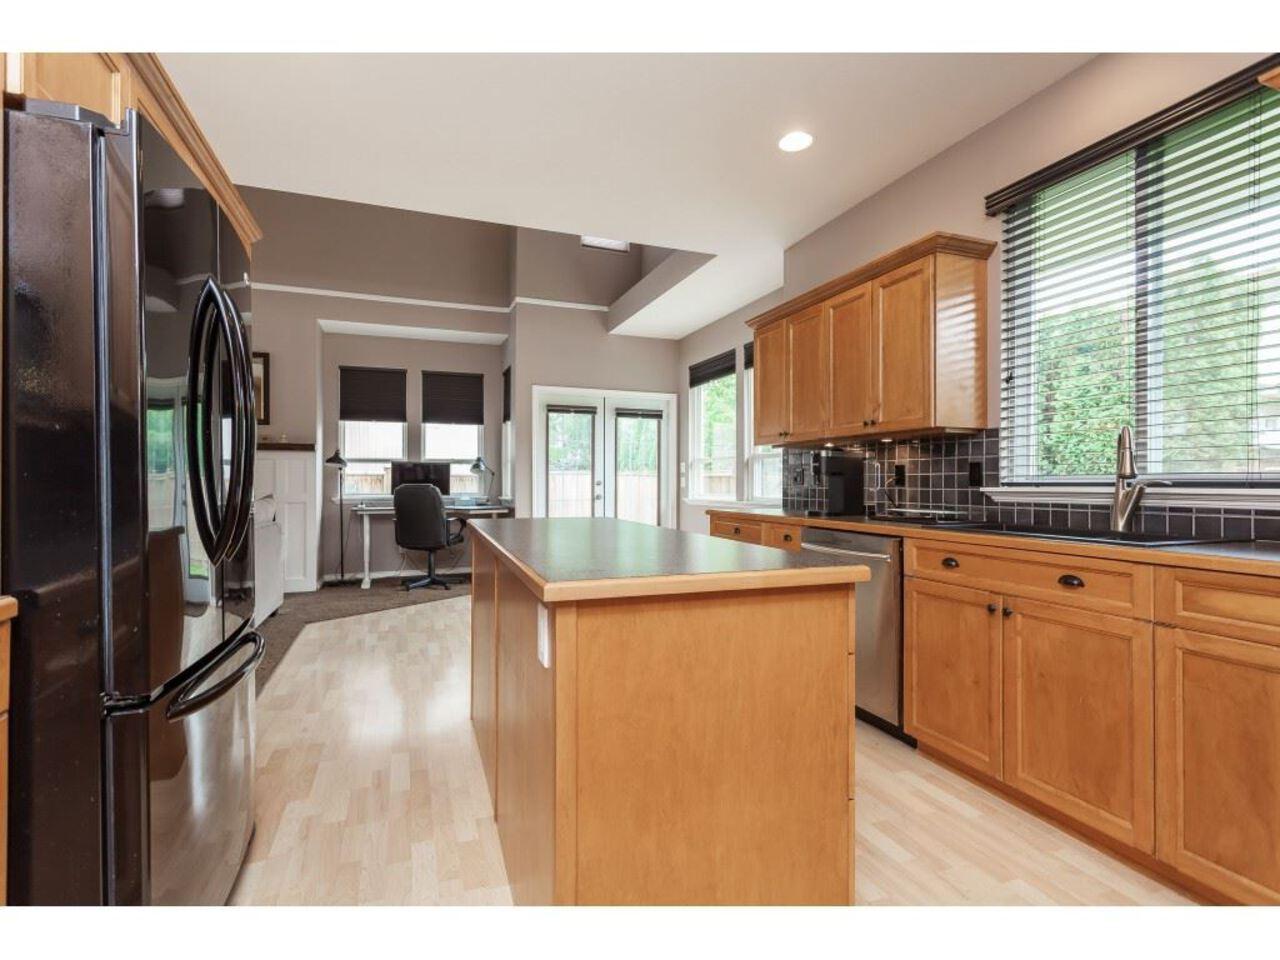 21058-85a-avenue-walnut-grove-langley-20 at 21058 85a Avenue, Walnut Grove, Langley